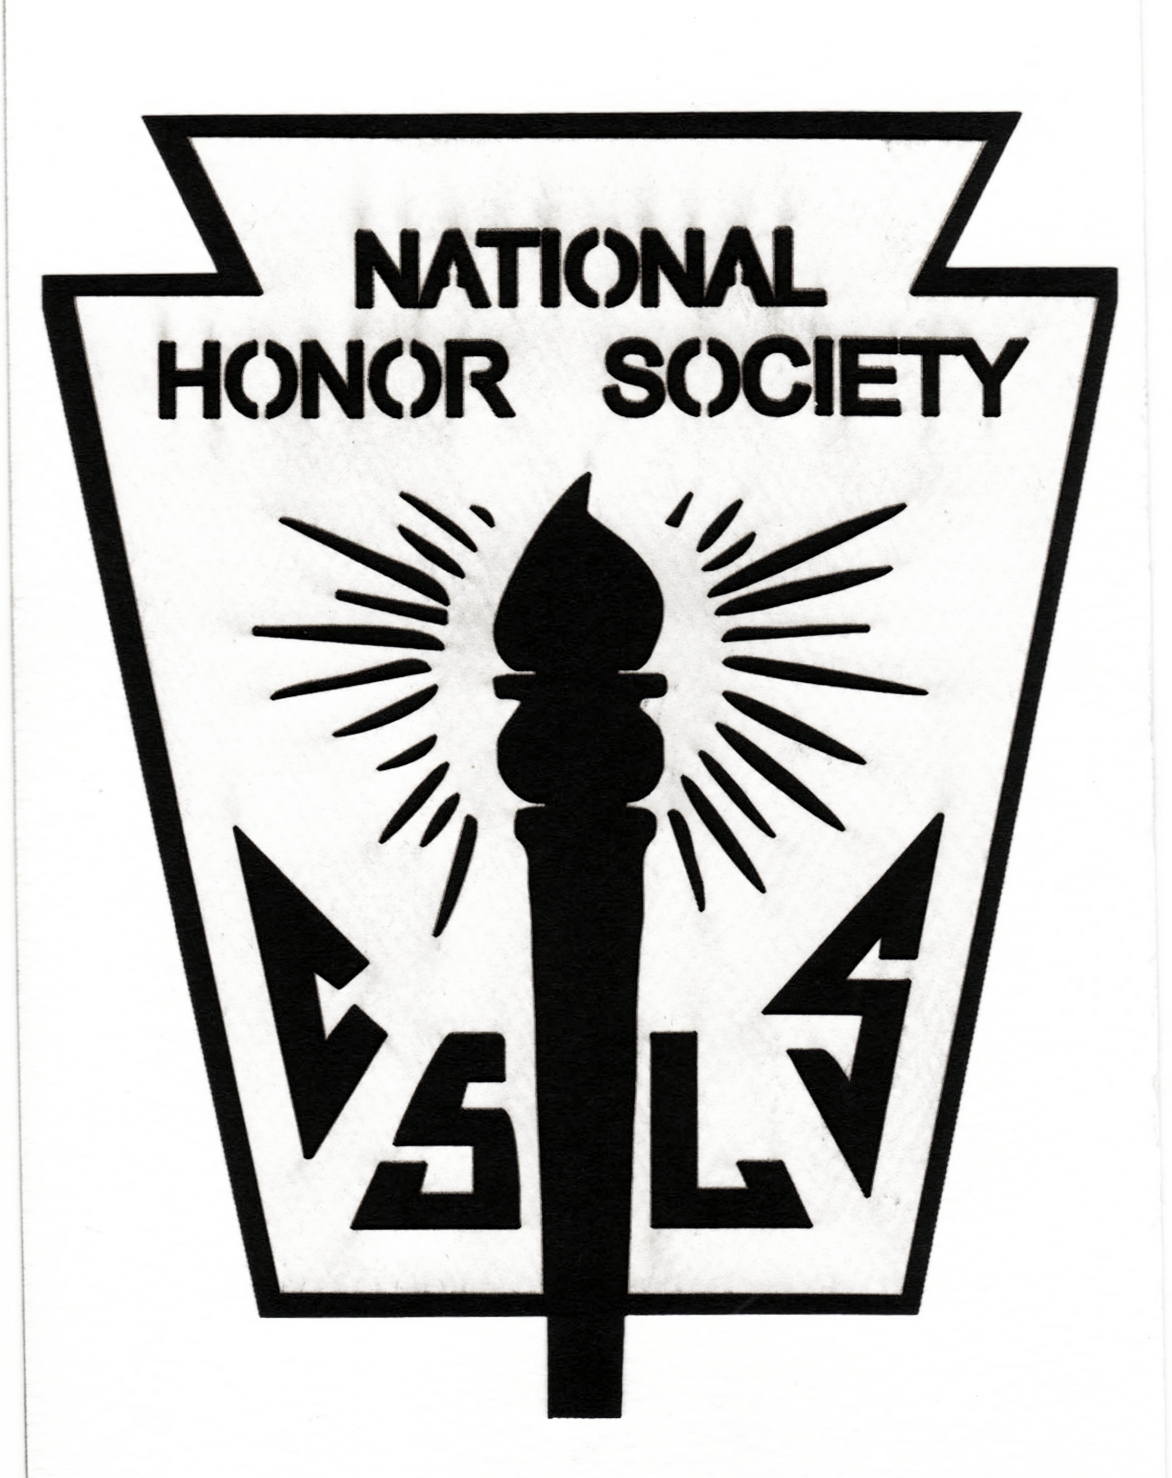 Drawn torch national junior honor society National Society Honor Clip Clip